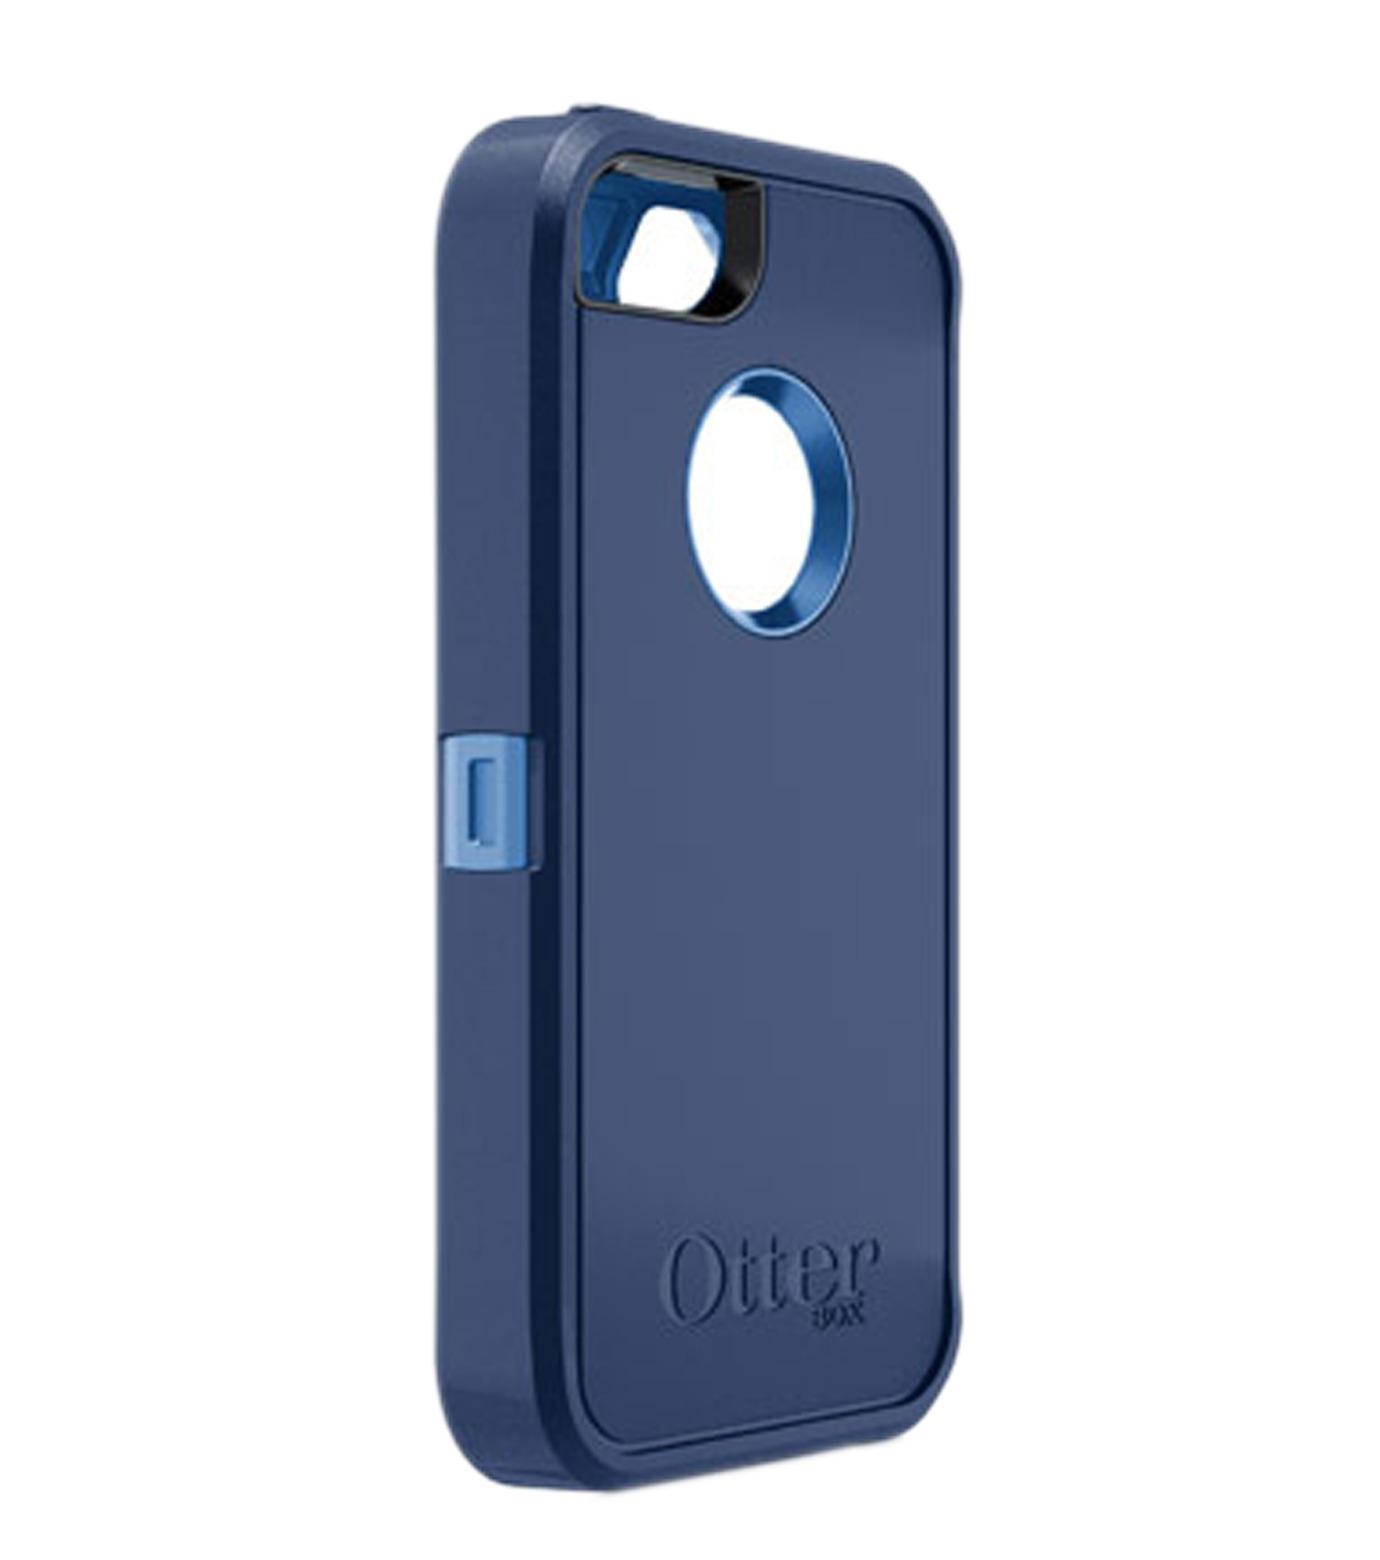 Tunewear(チューンウエア)のiPhone5 Case-BLUE-OTB-PH-013-92 拡大詳細画像1